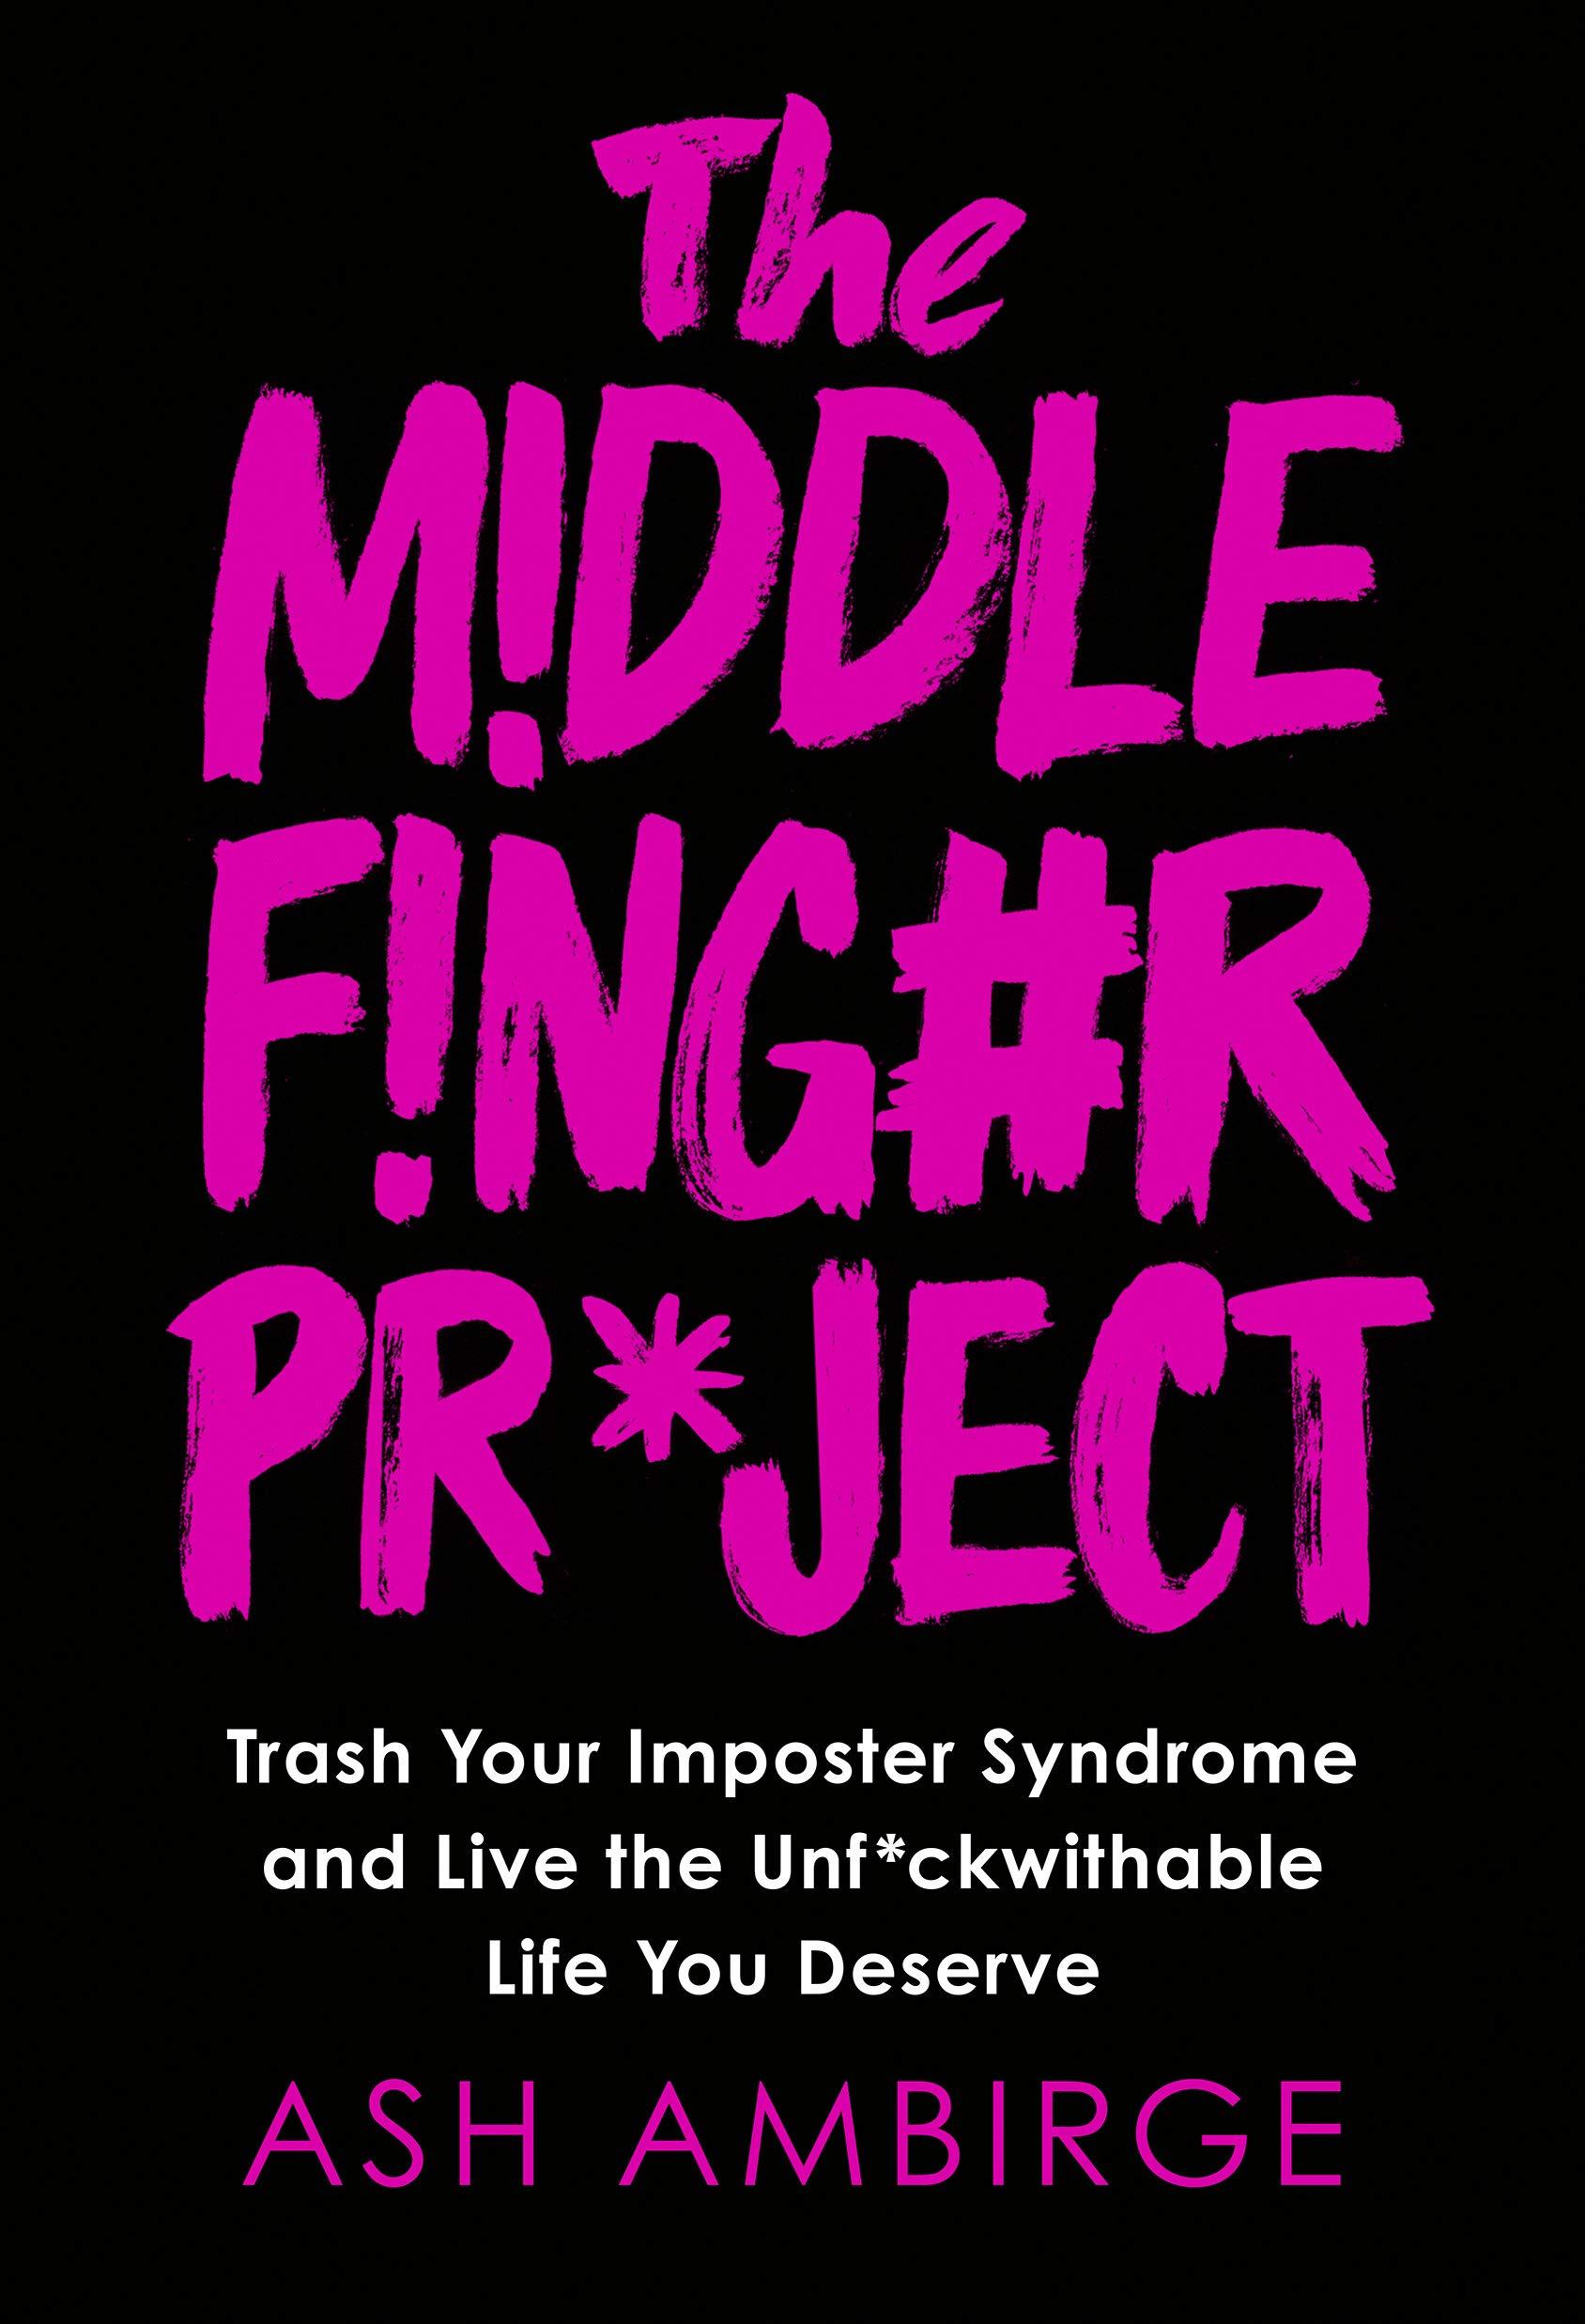 The Middle Finger Project Black Friday Entrepreneur